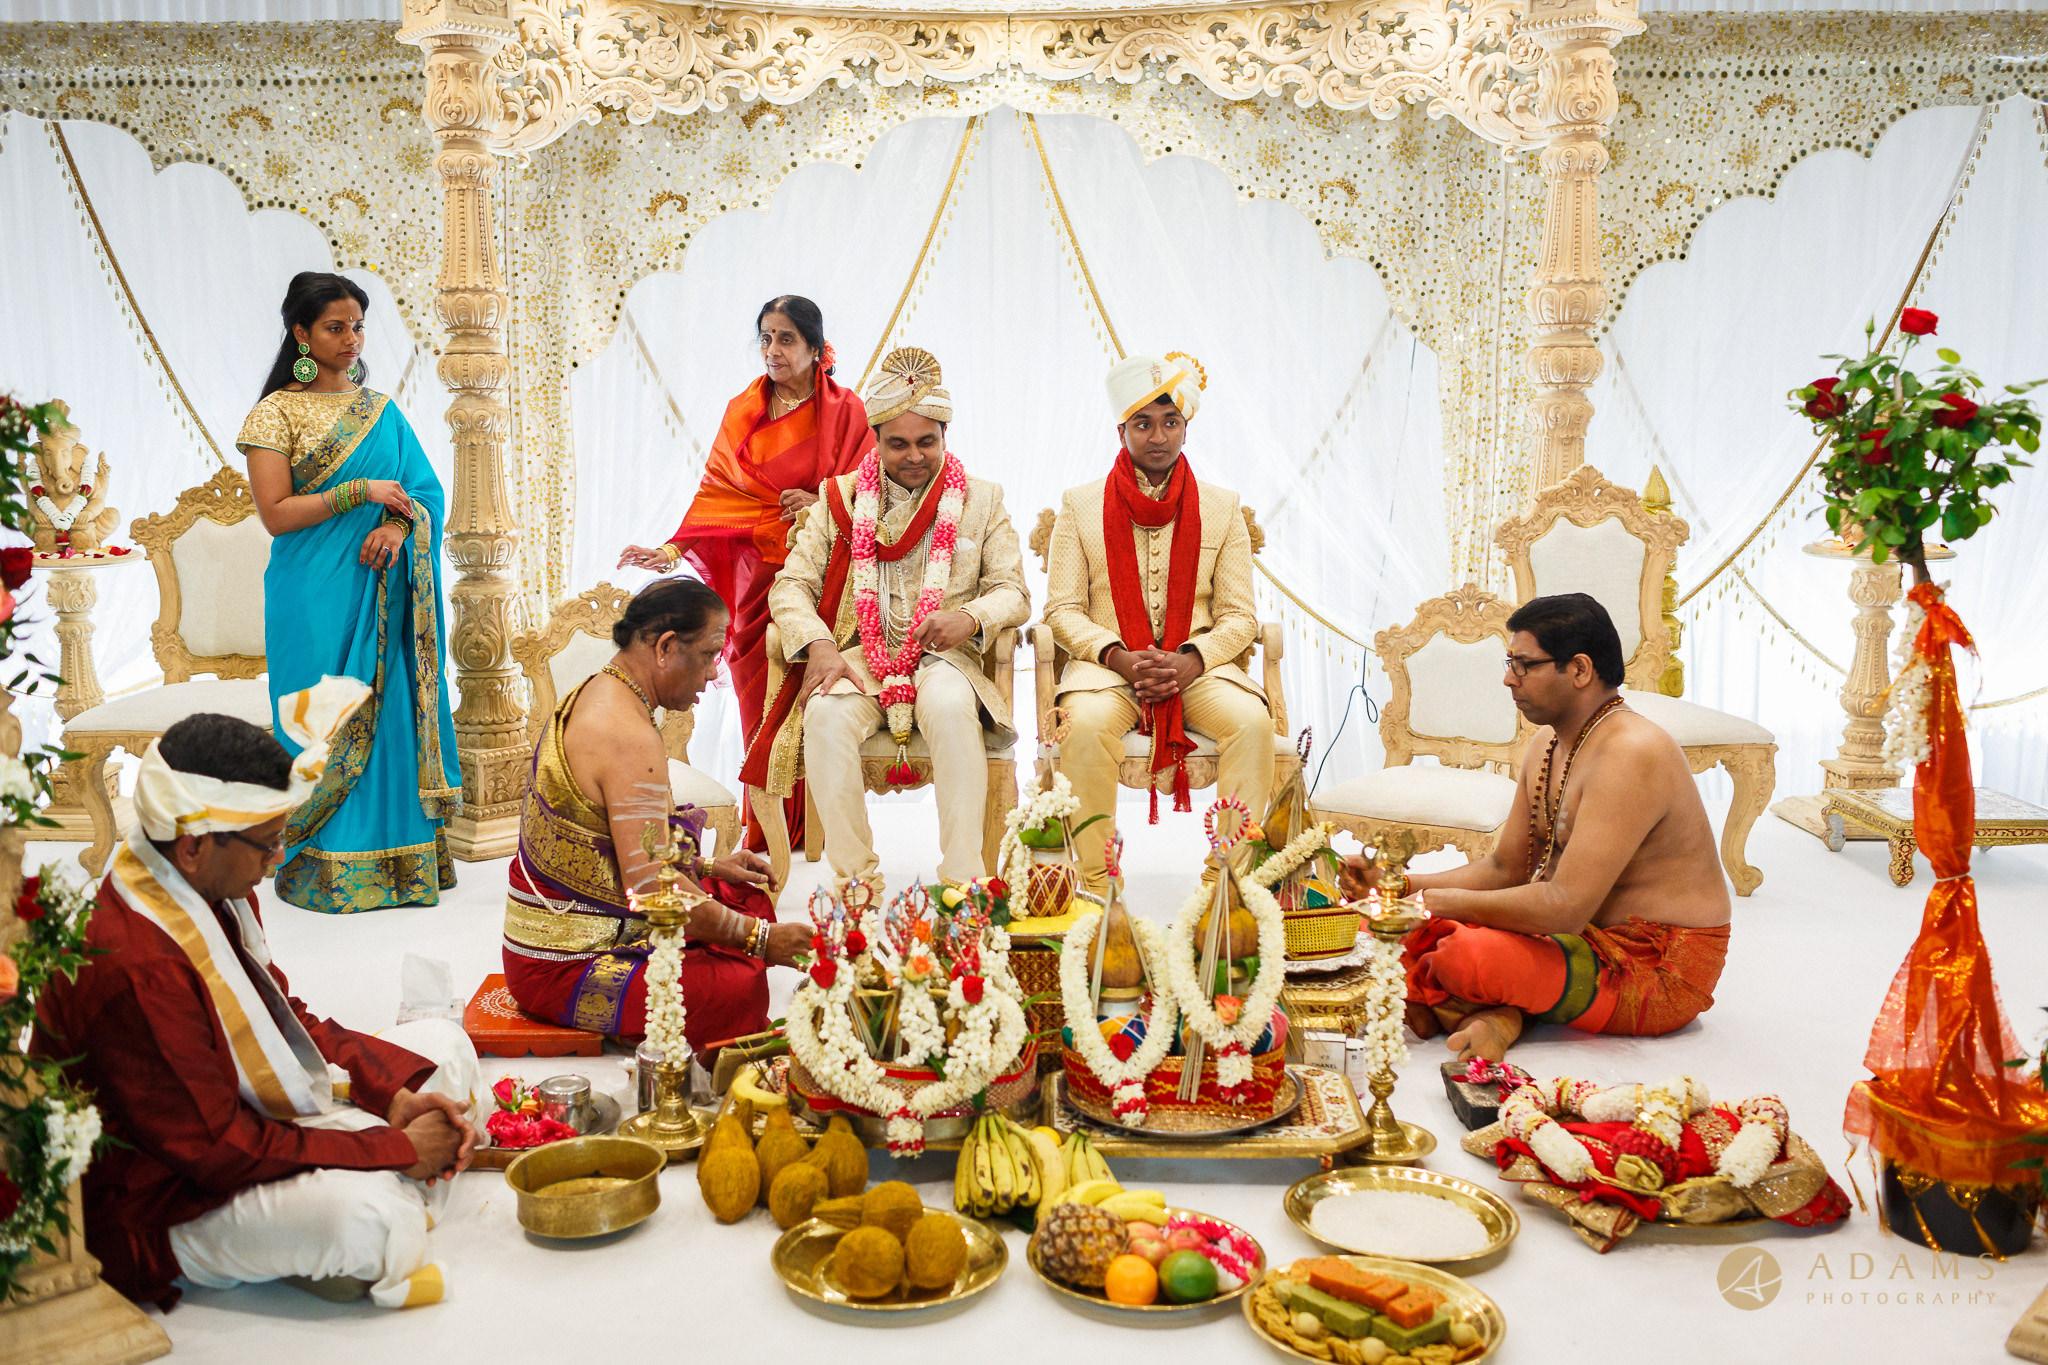 Asian wedding ceremony starts